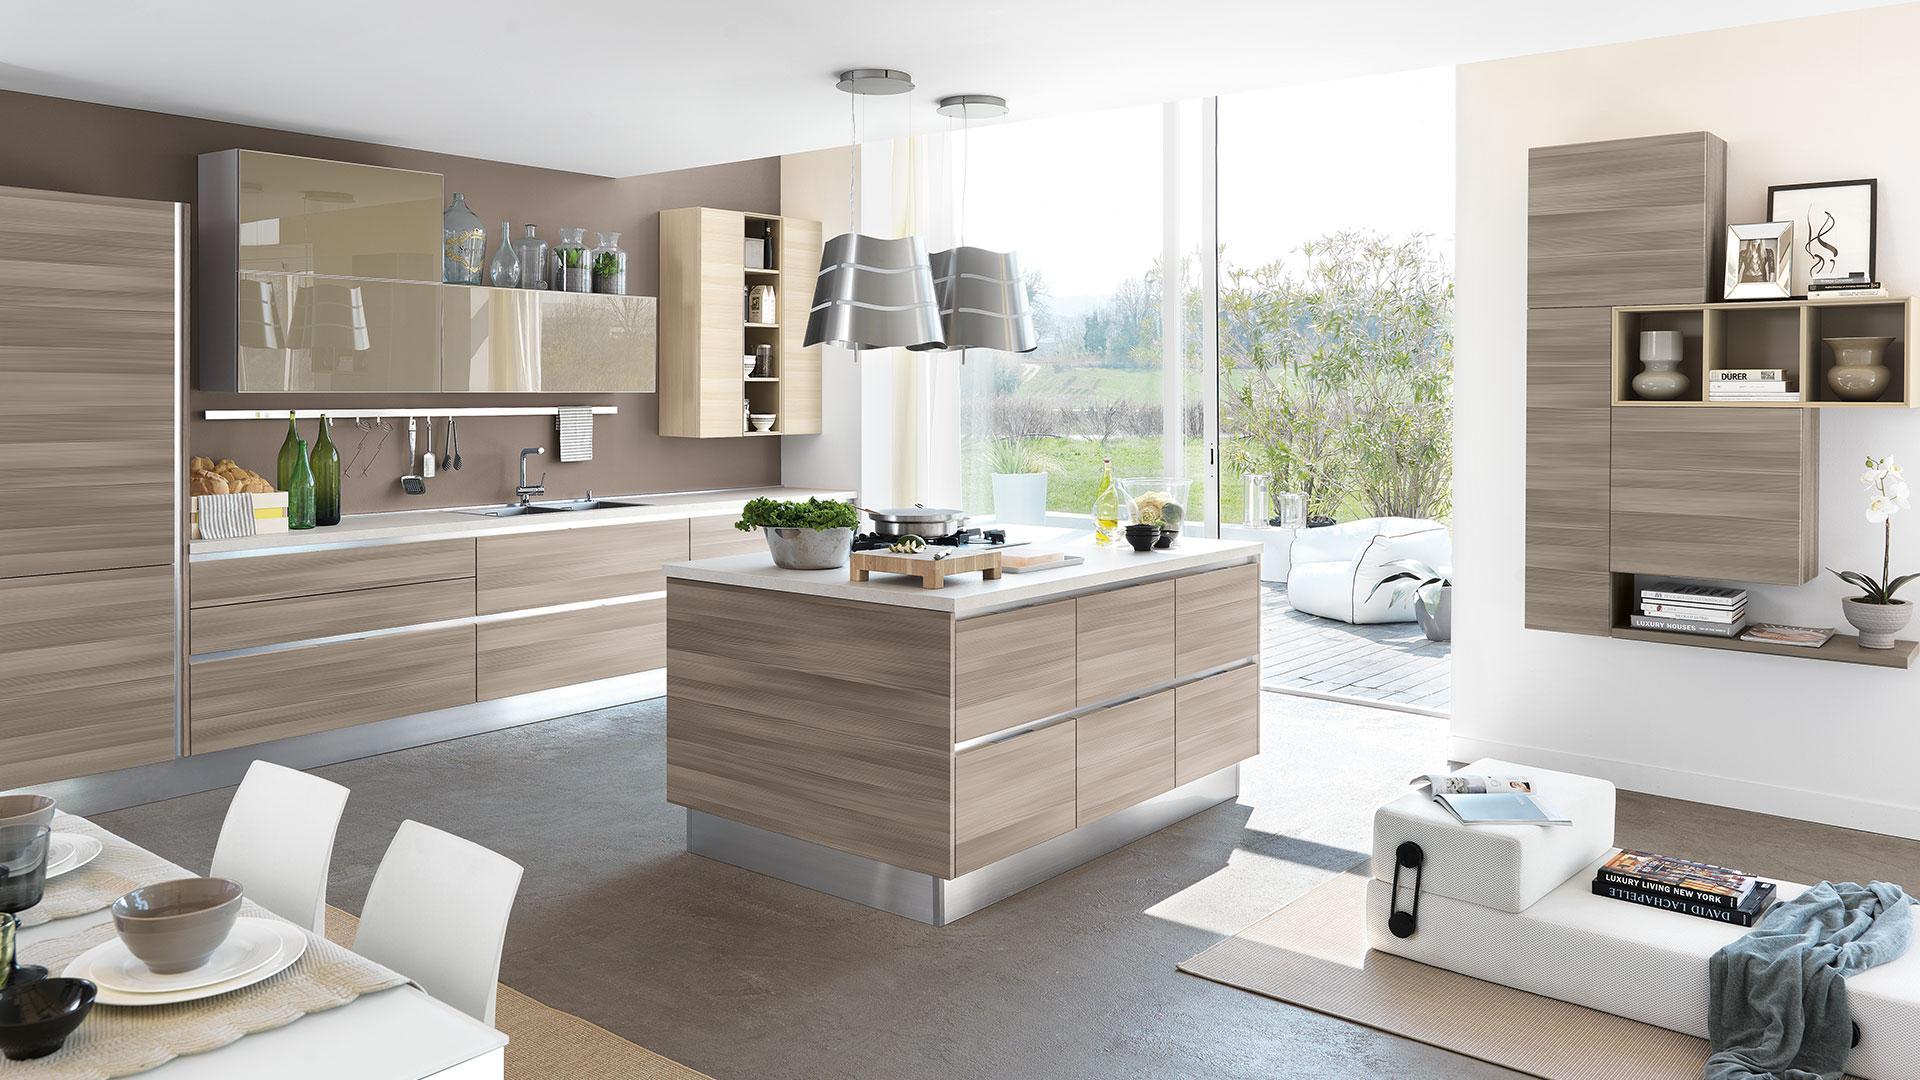 Lube essenza arredalcasa for Arredamenti moderni cucine